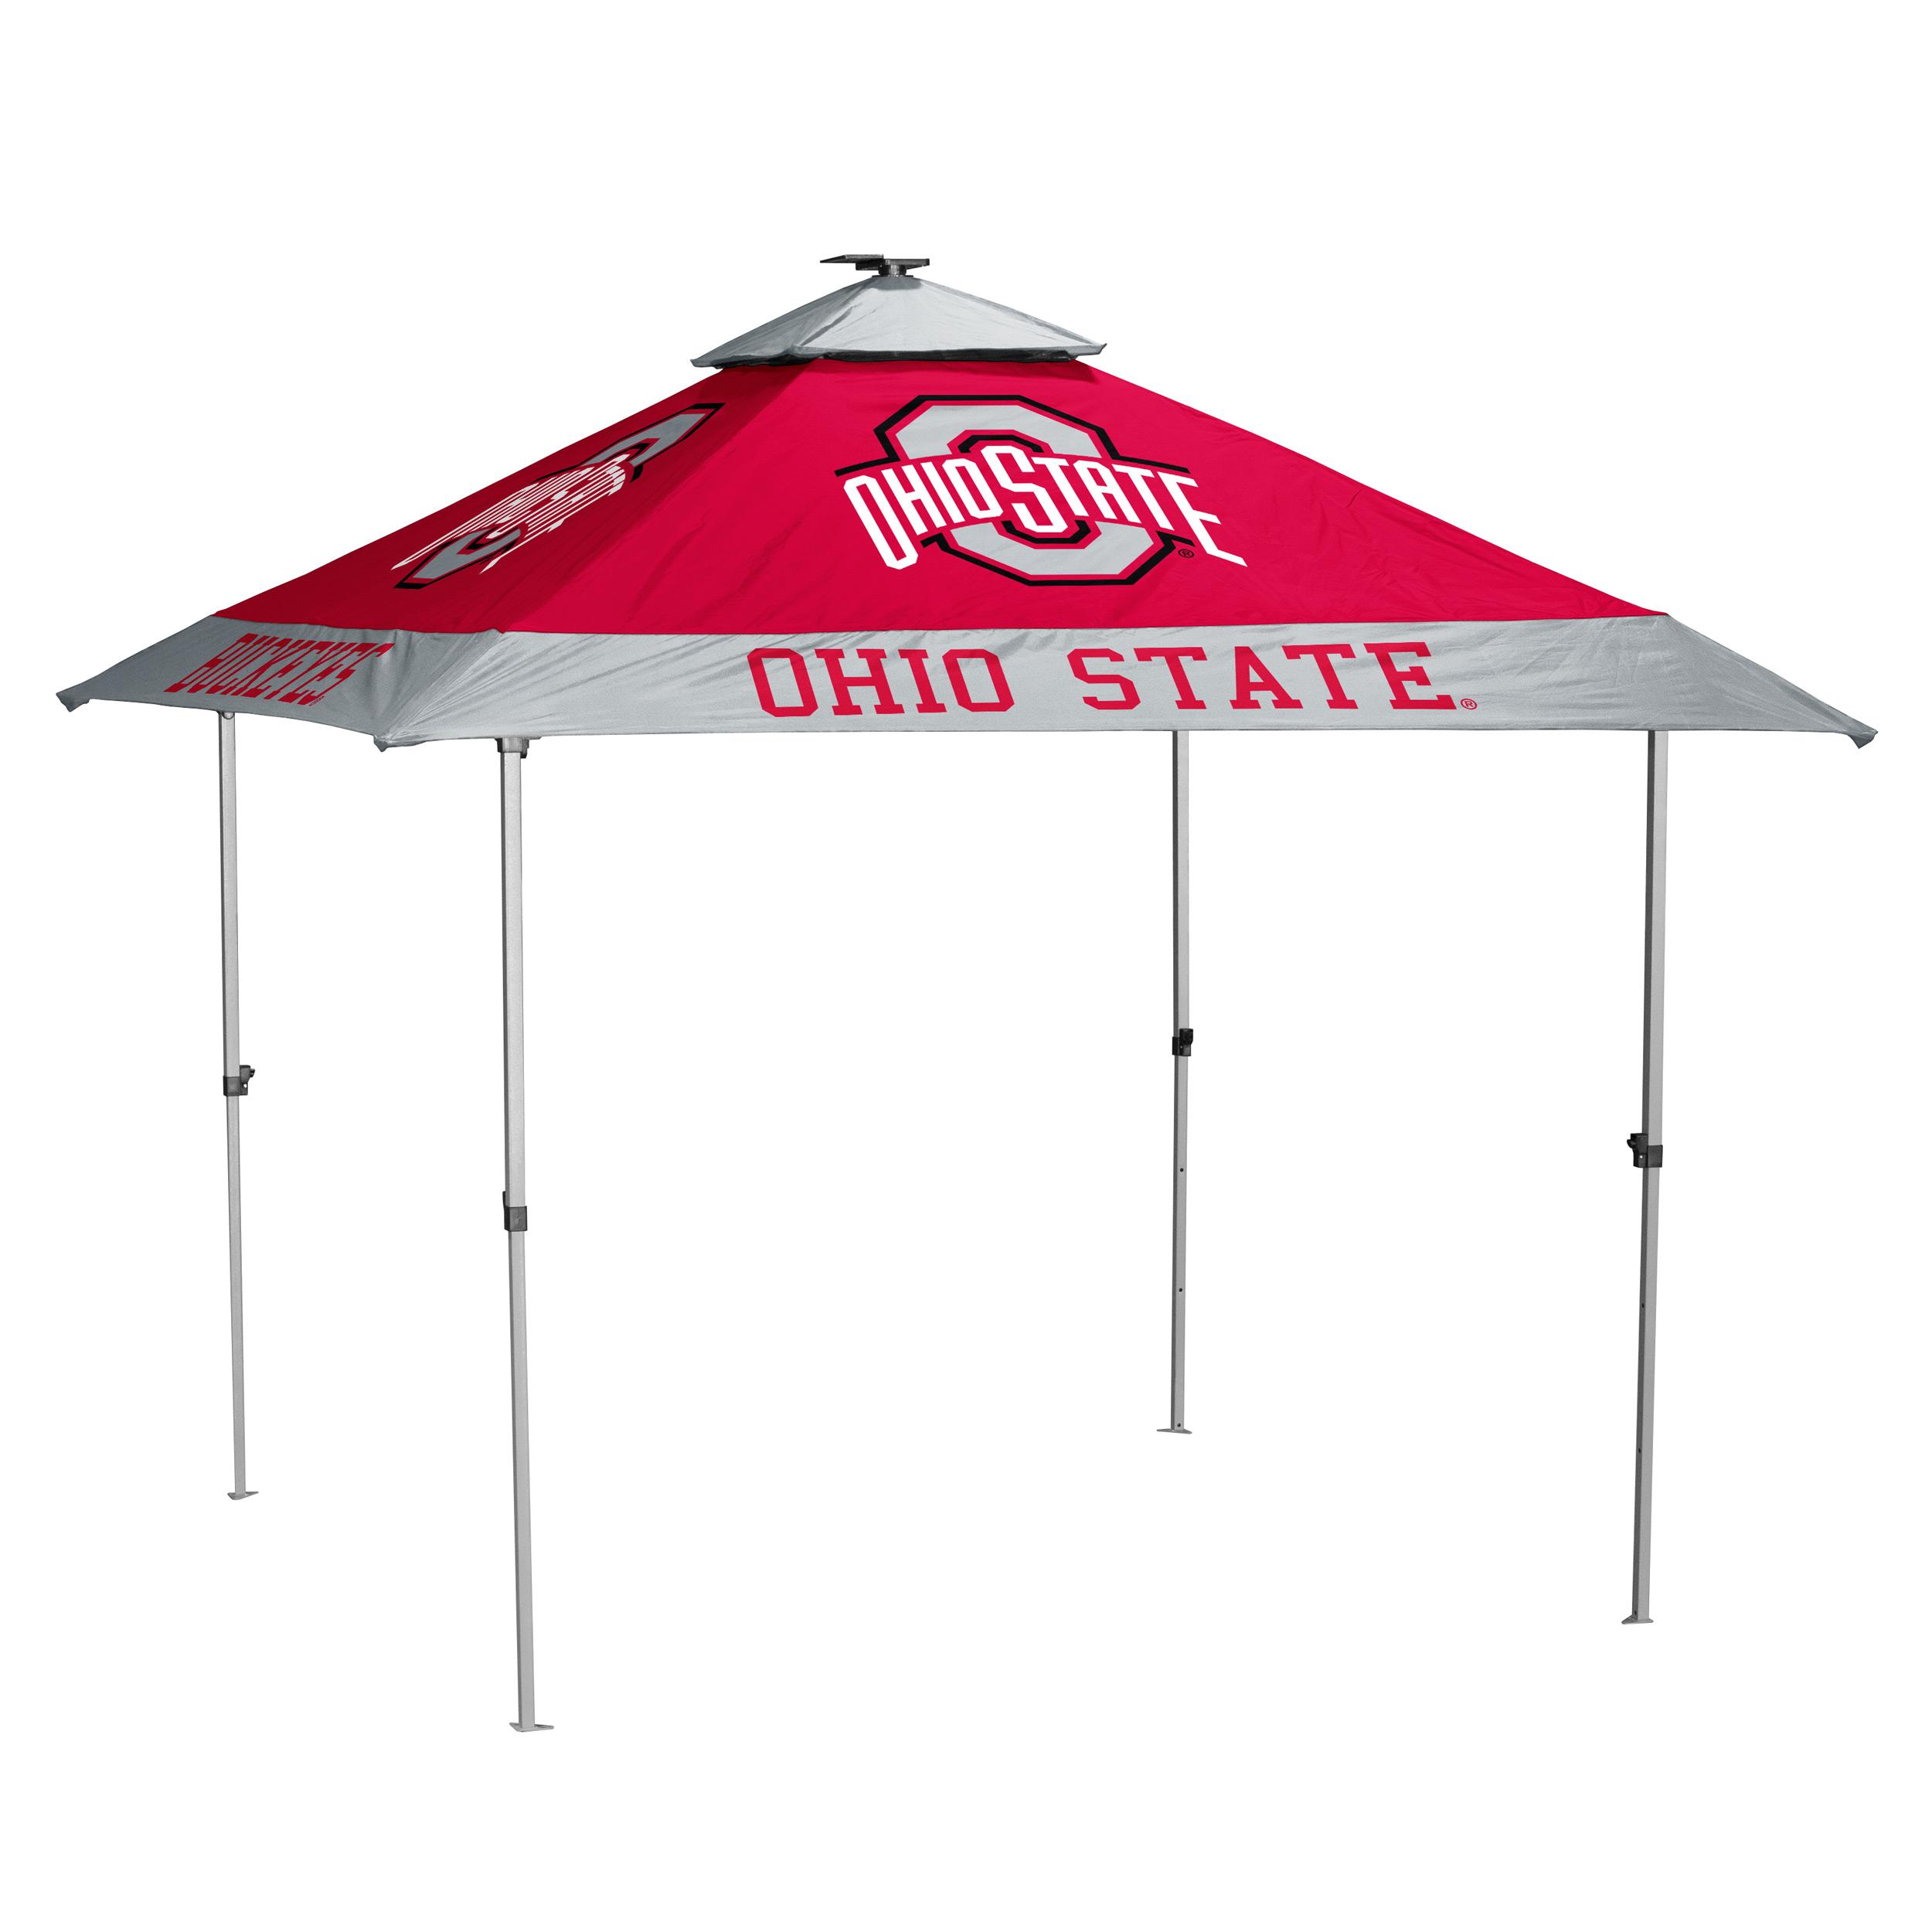 Ohio State Pagoda Tent